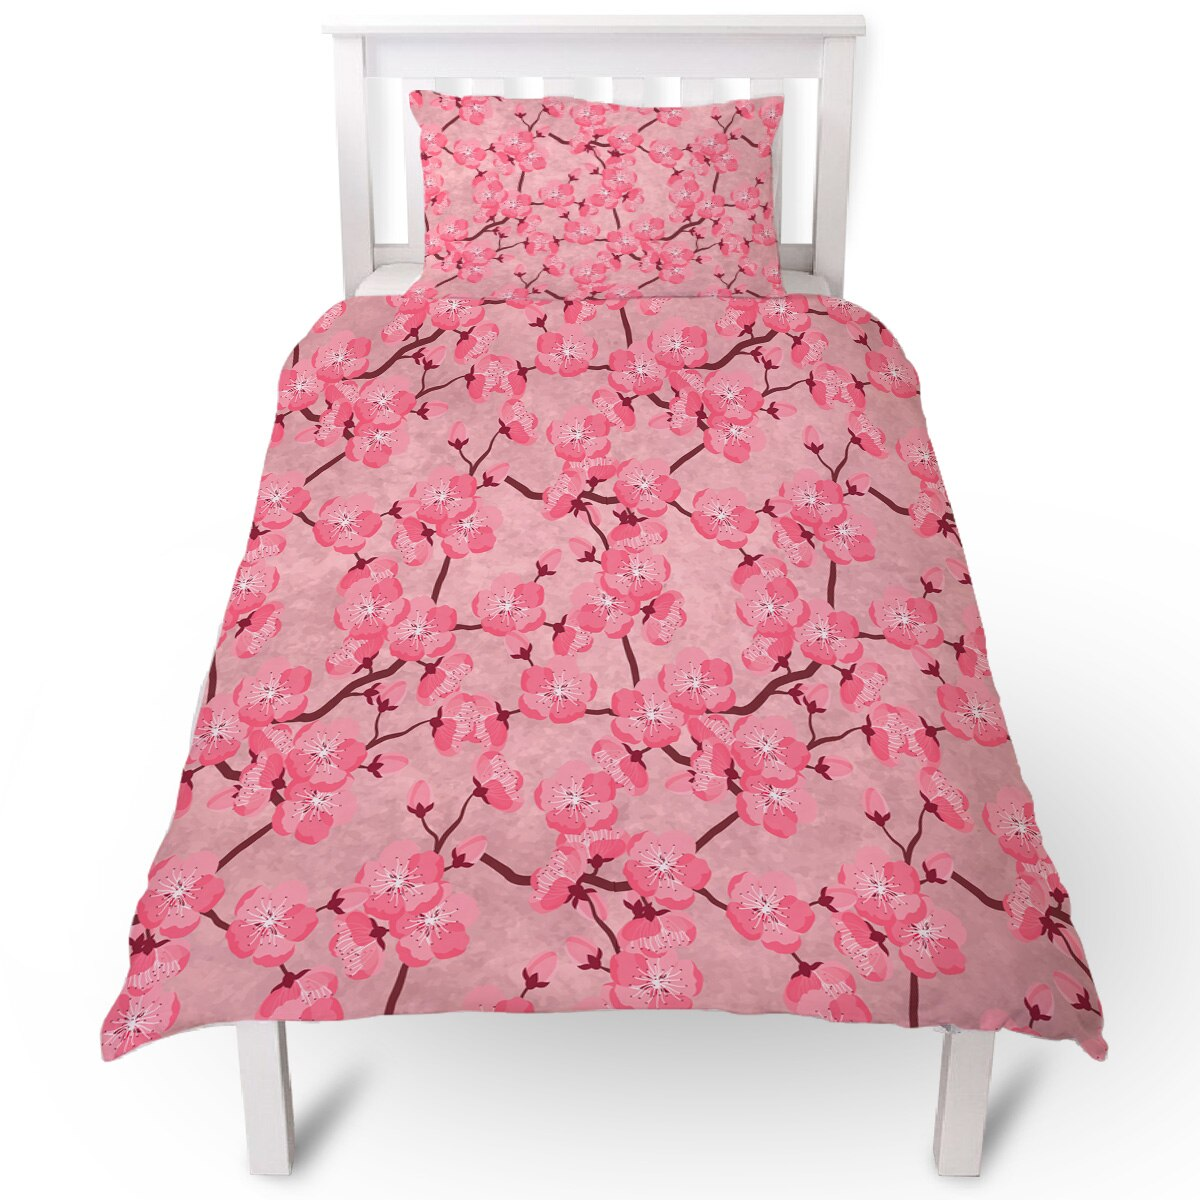 Flower Japan Cherry Blossoms Duvet Cover Pillow Case Quilt Cover Set Bedclothes Single Bedding Sets For Bed